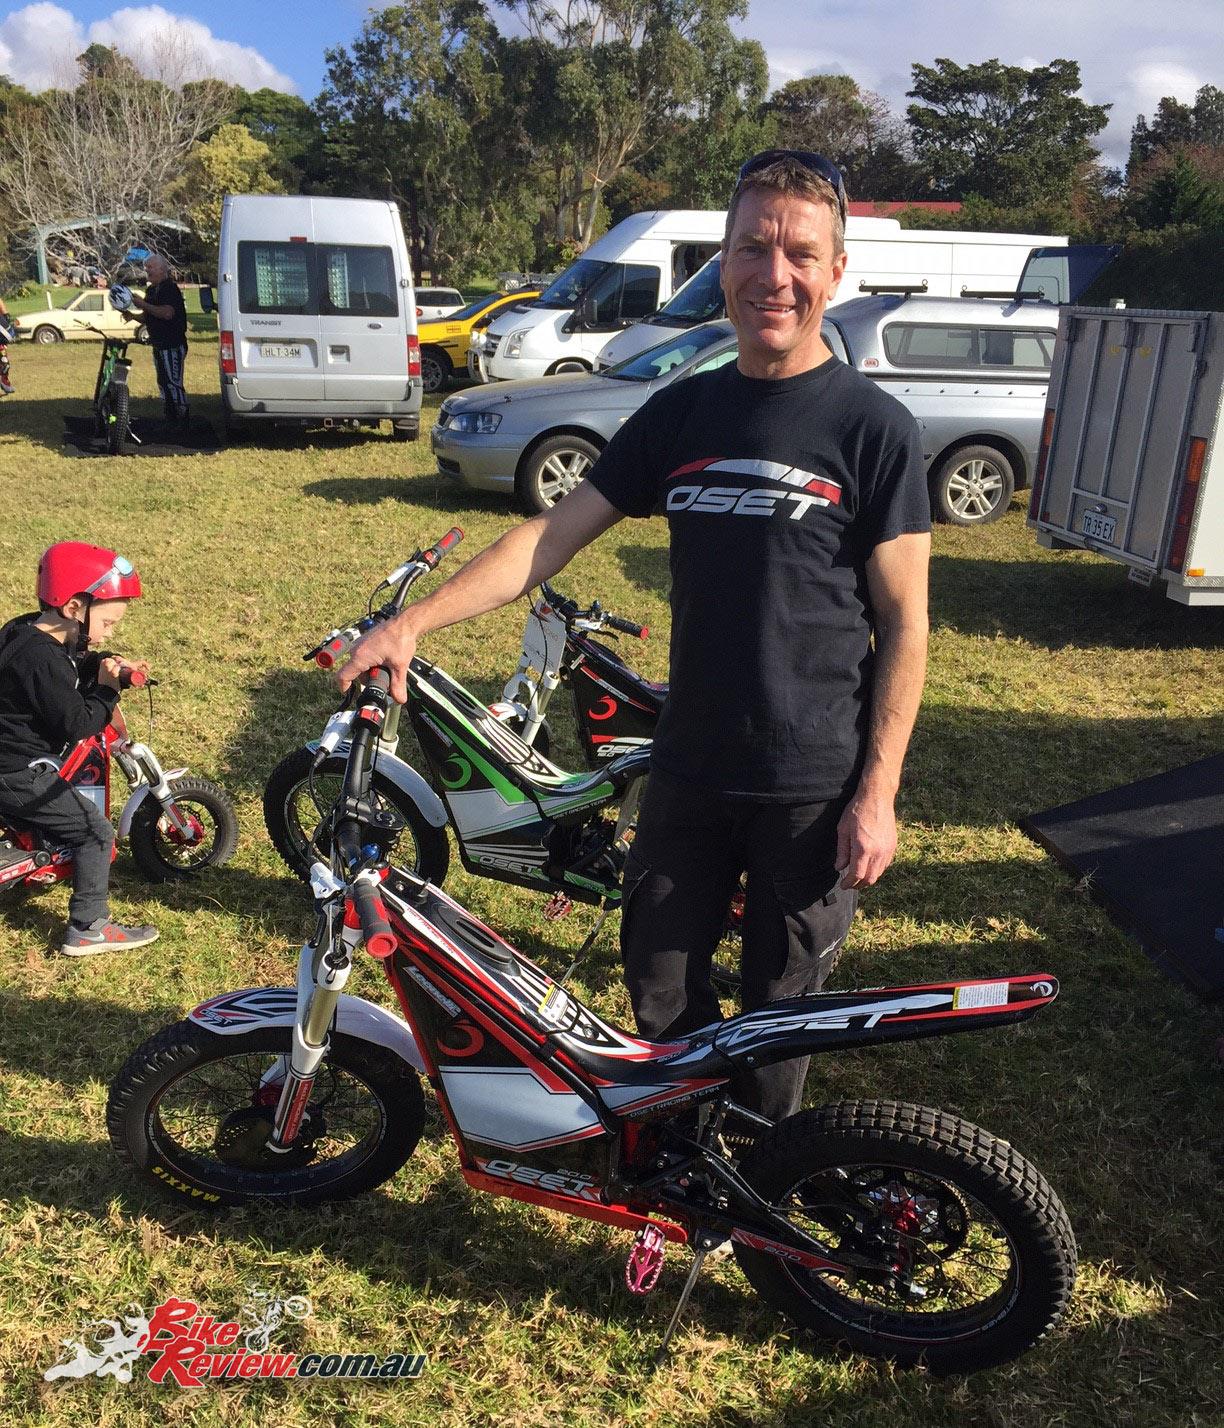 OSET electric trials bikes